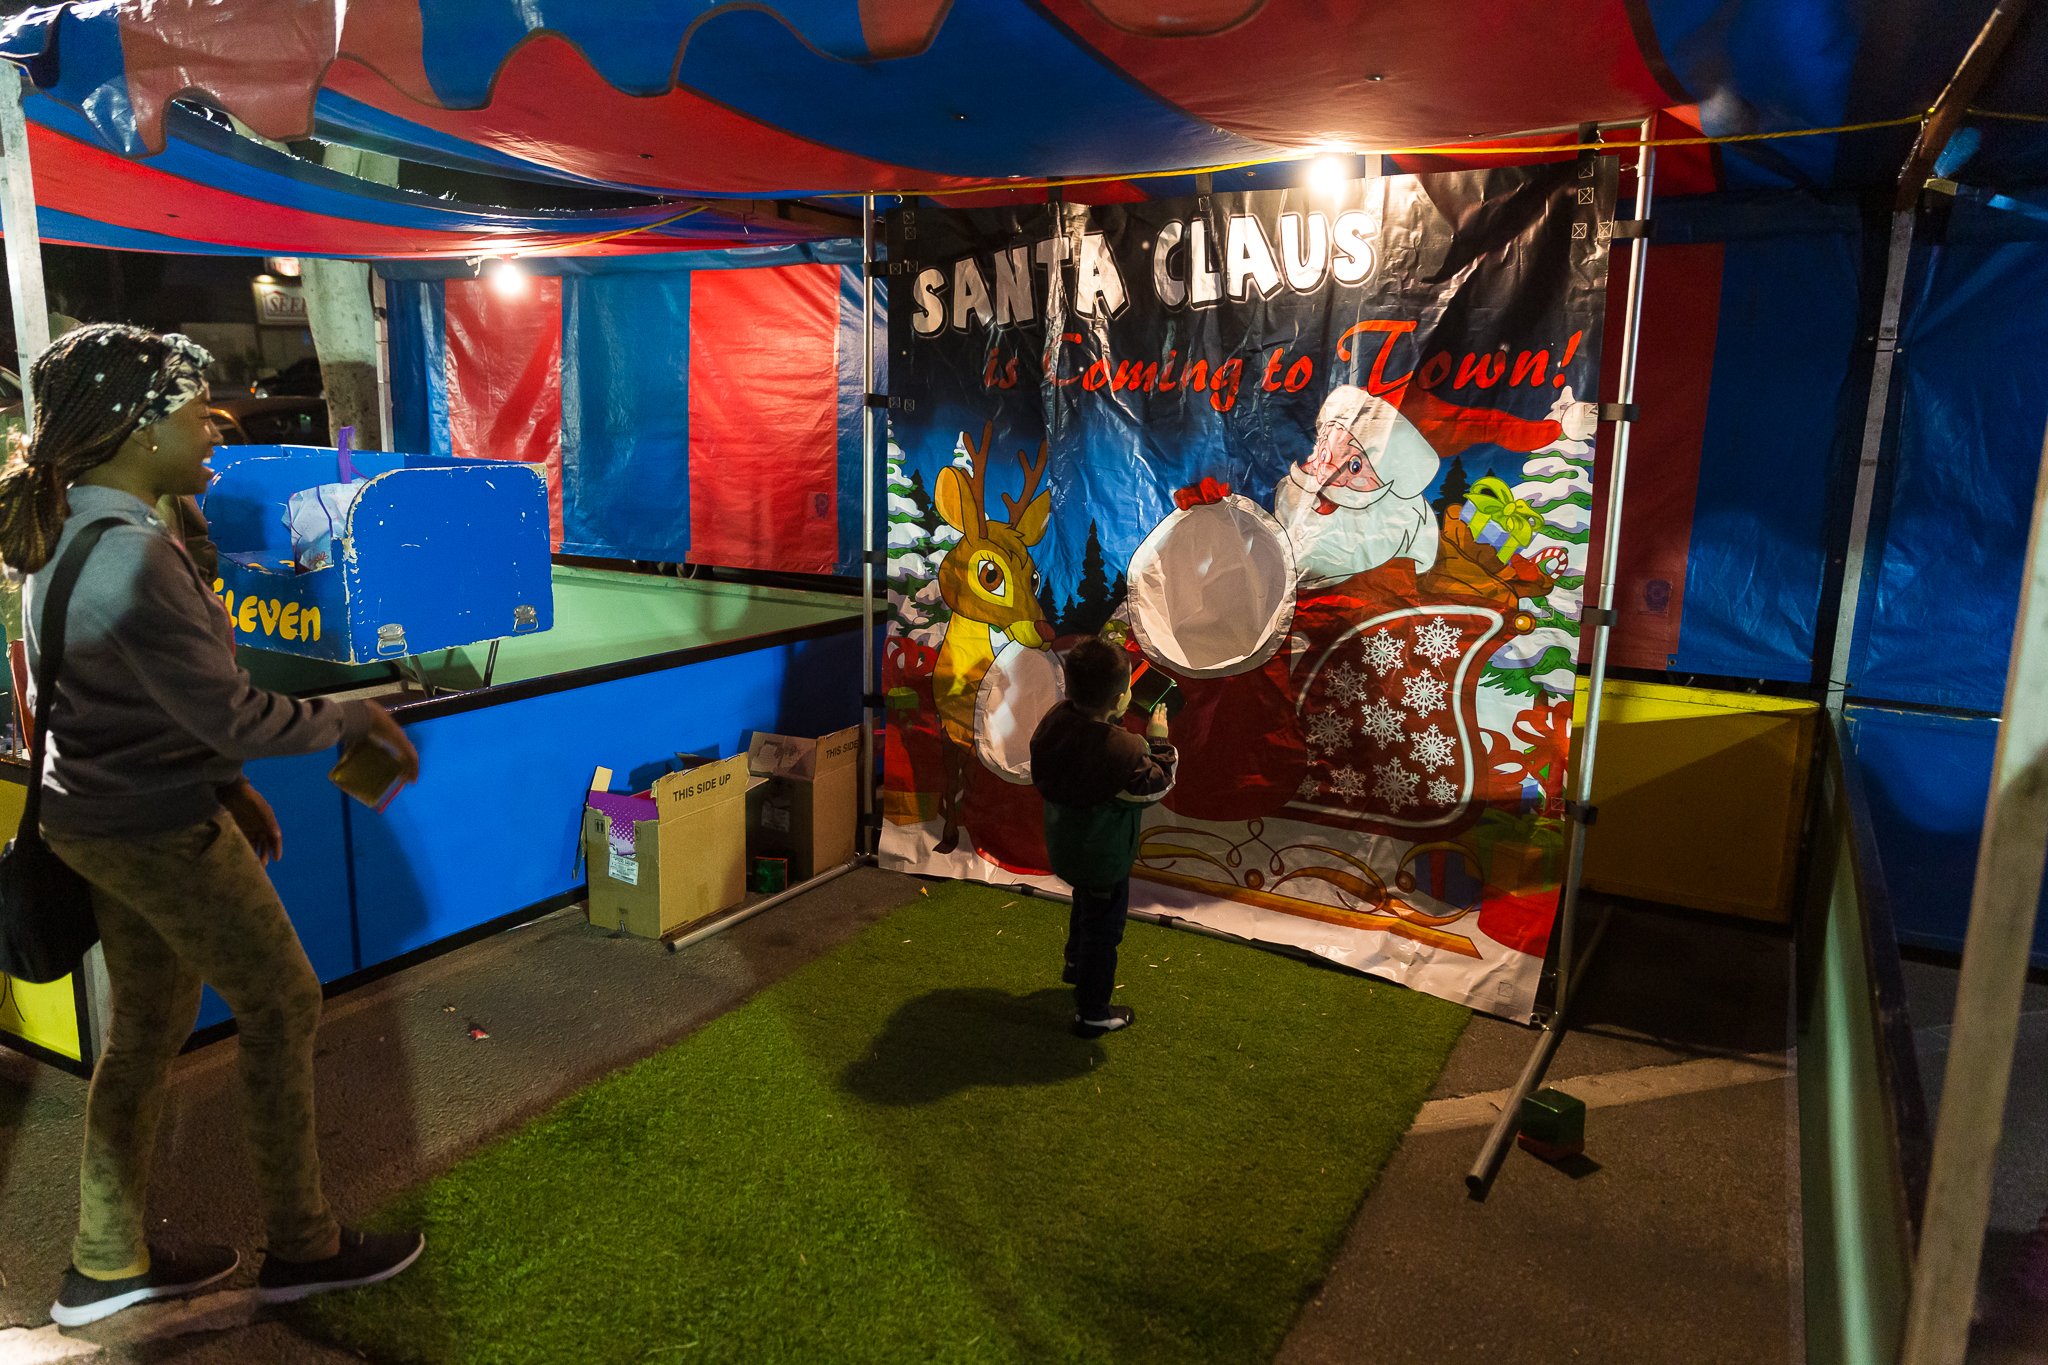 Santa game toss